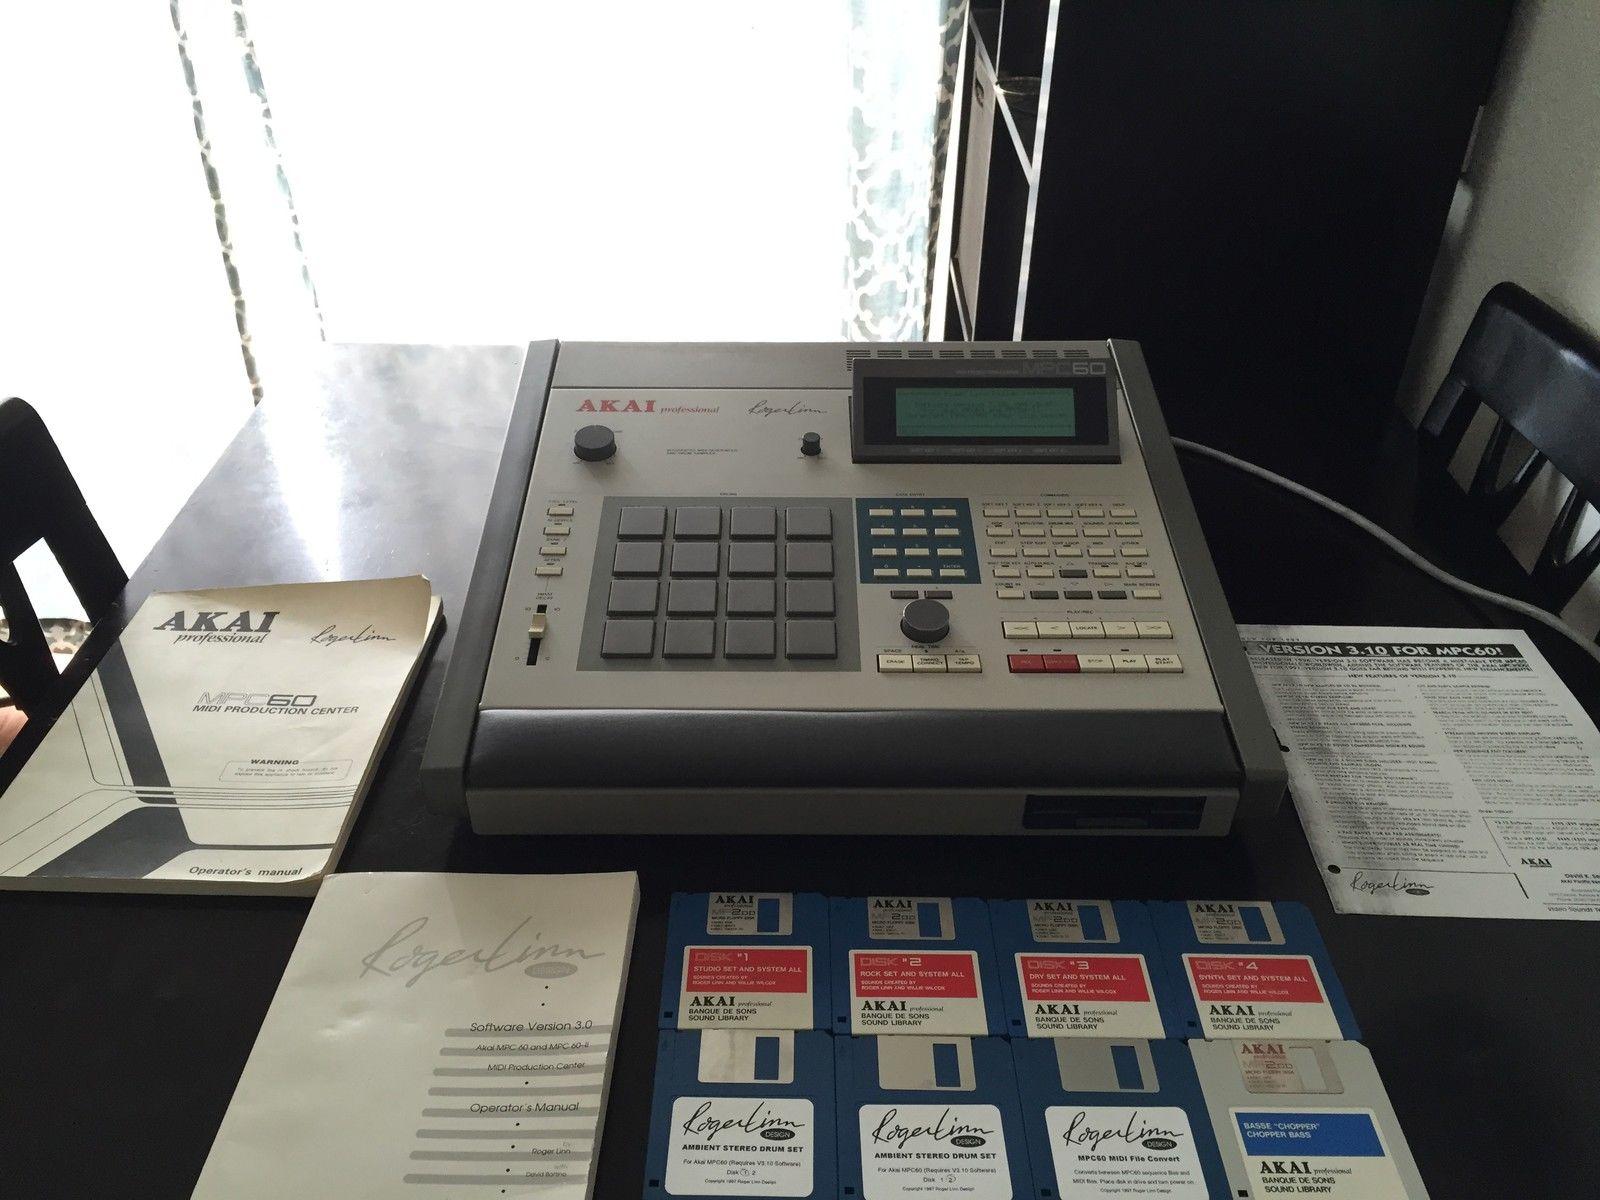 mpchunter mpc 60 rh mpchunter com akai mpc 60 manual pdf akai mpc 60 service manual